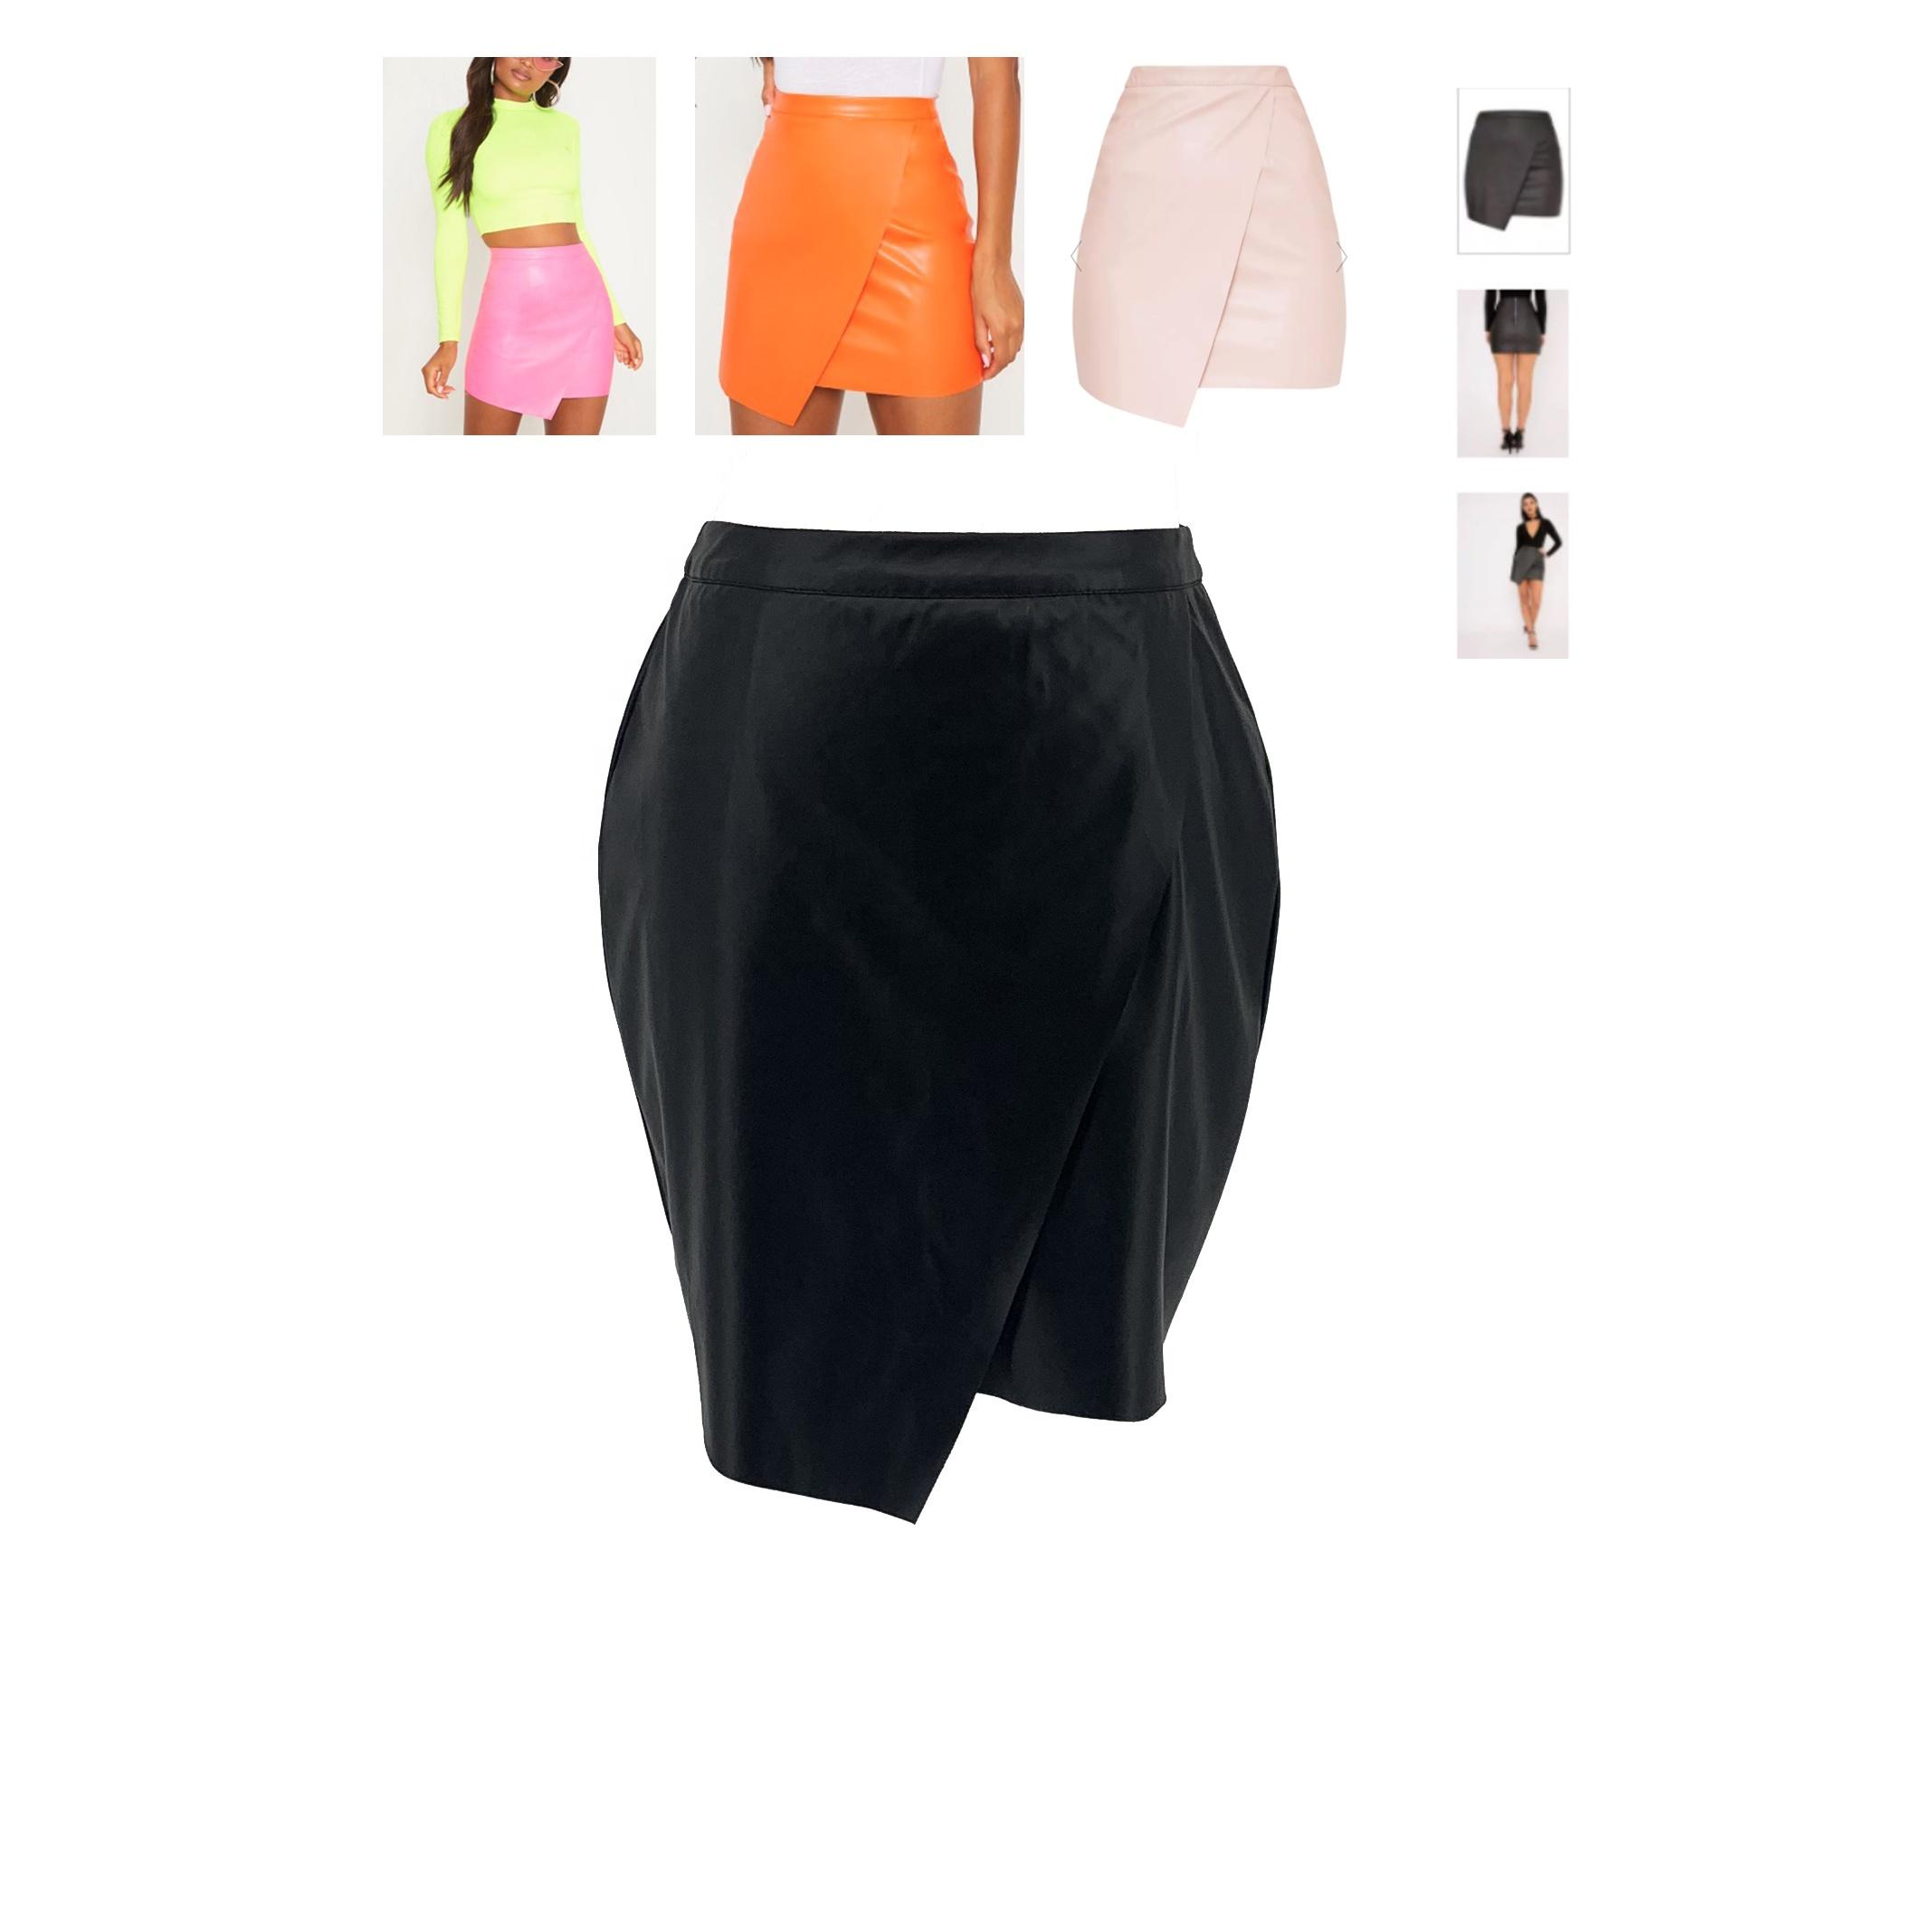 4415603268c34 Frauen Klassische Hohe Taille Faux Leder Bodycon Schlank Mini Bleistift Rock